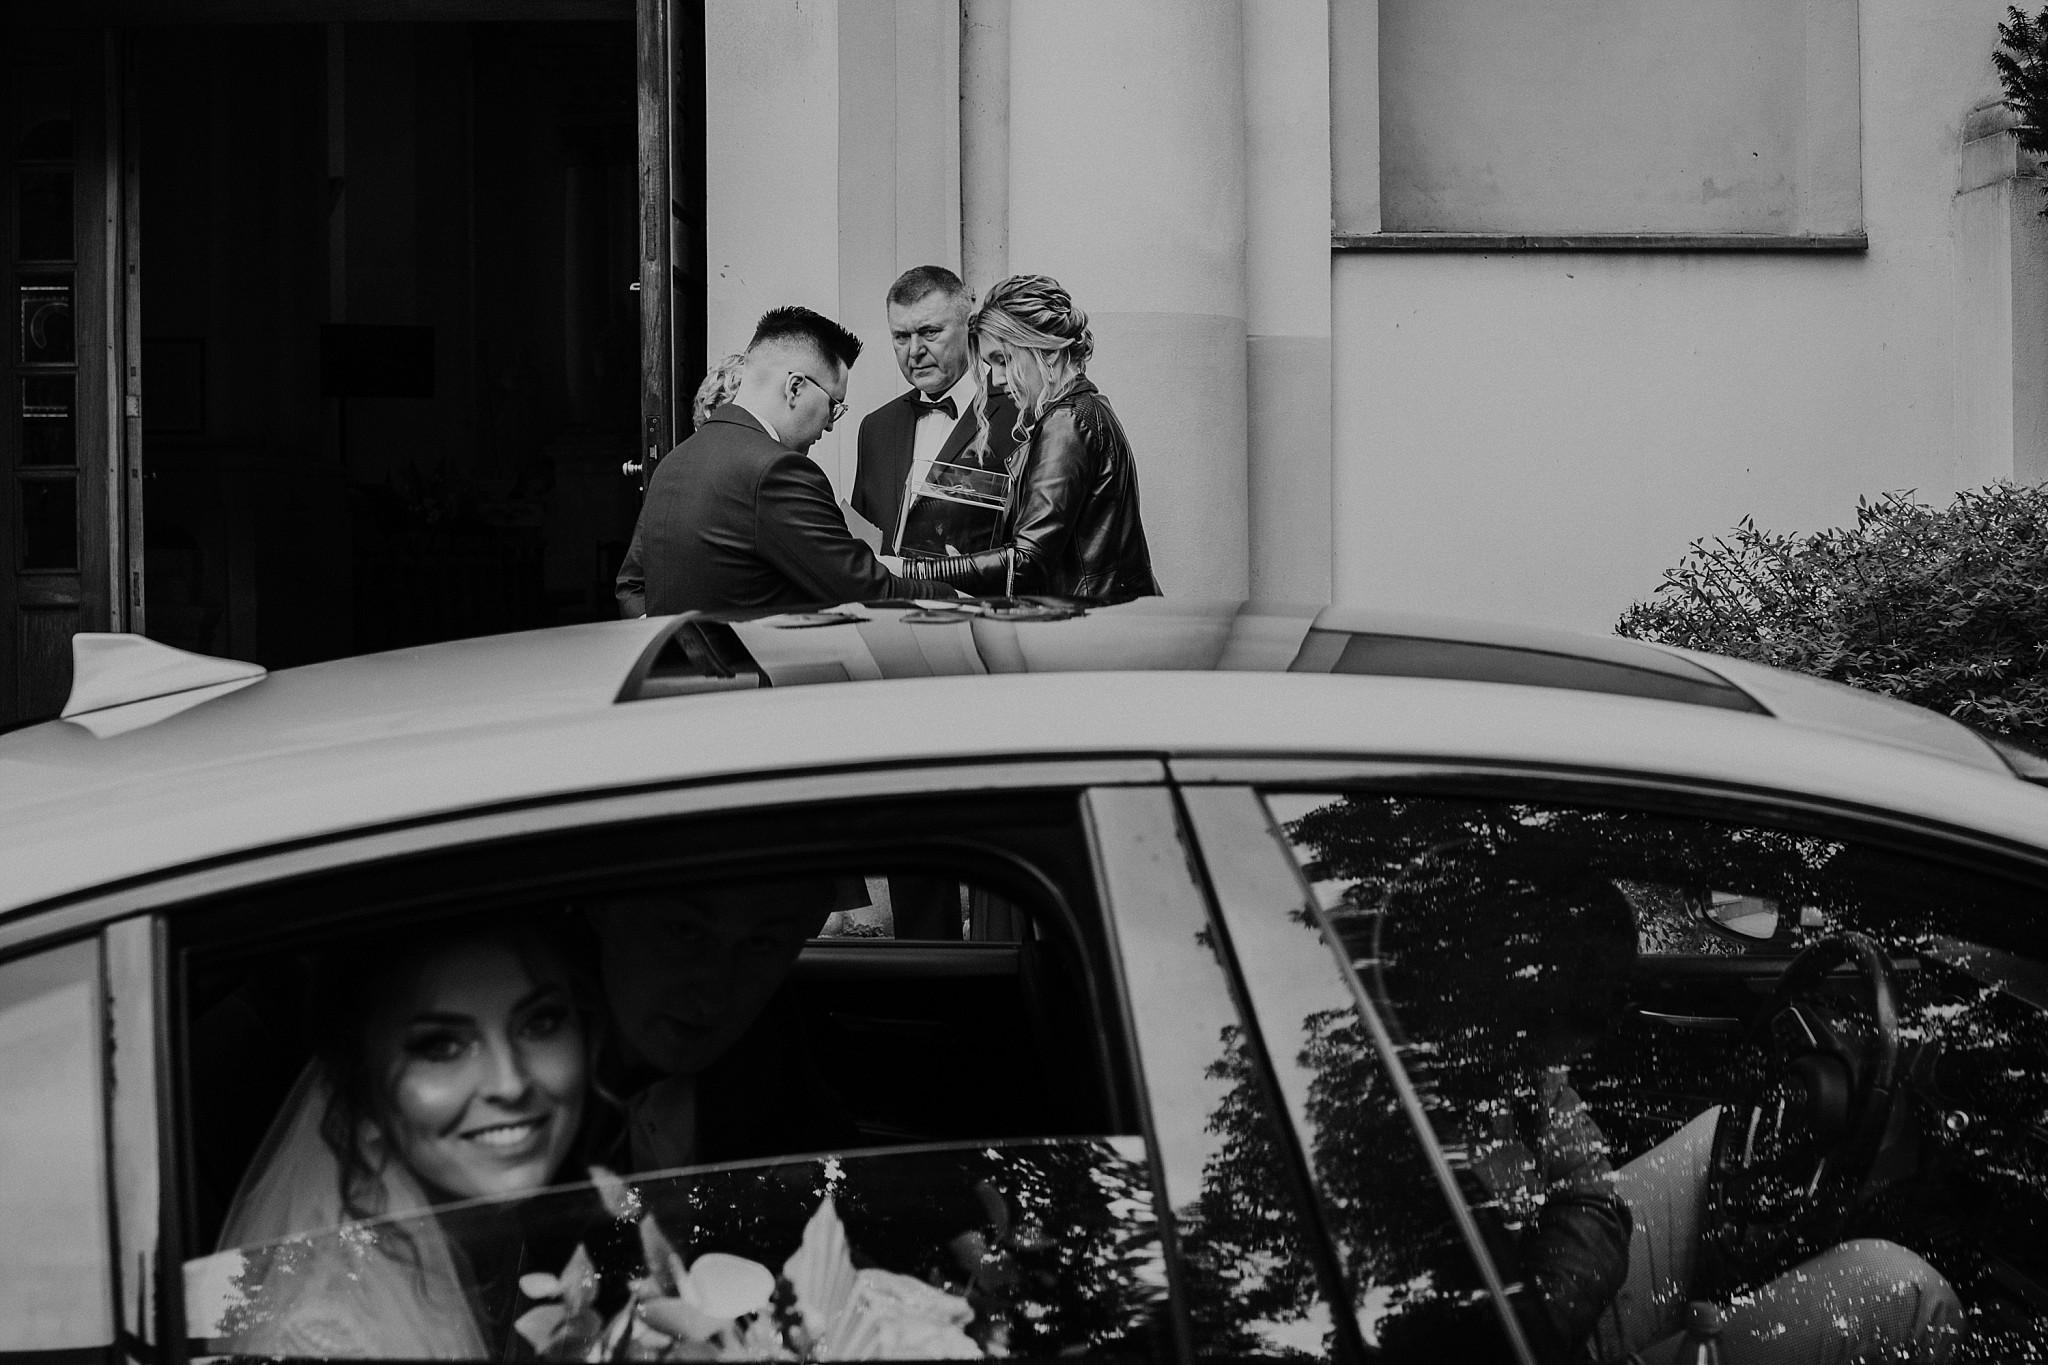 fotograf poznan wesele dobra truskawka piekne wesele pod poznaniem wesele w dobrej truskawce piekna para mloda slub marzen slub koronawirus slub listopad wesele koronawirus 124